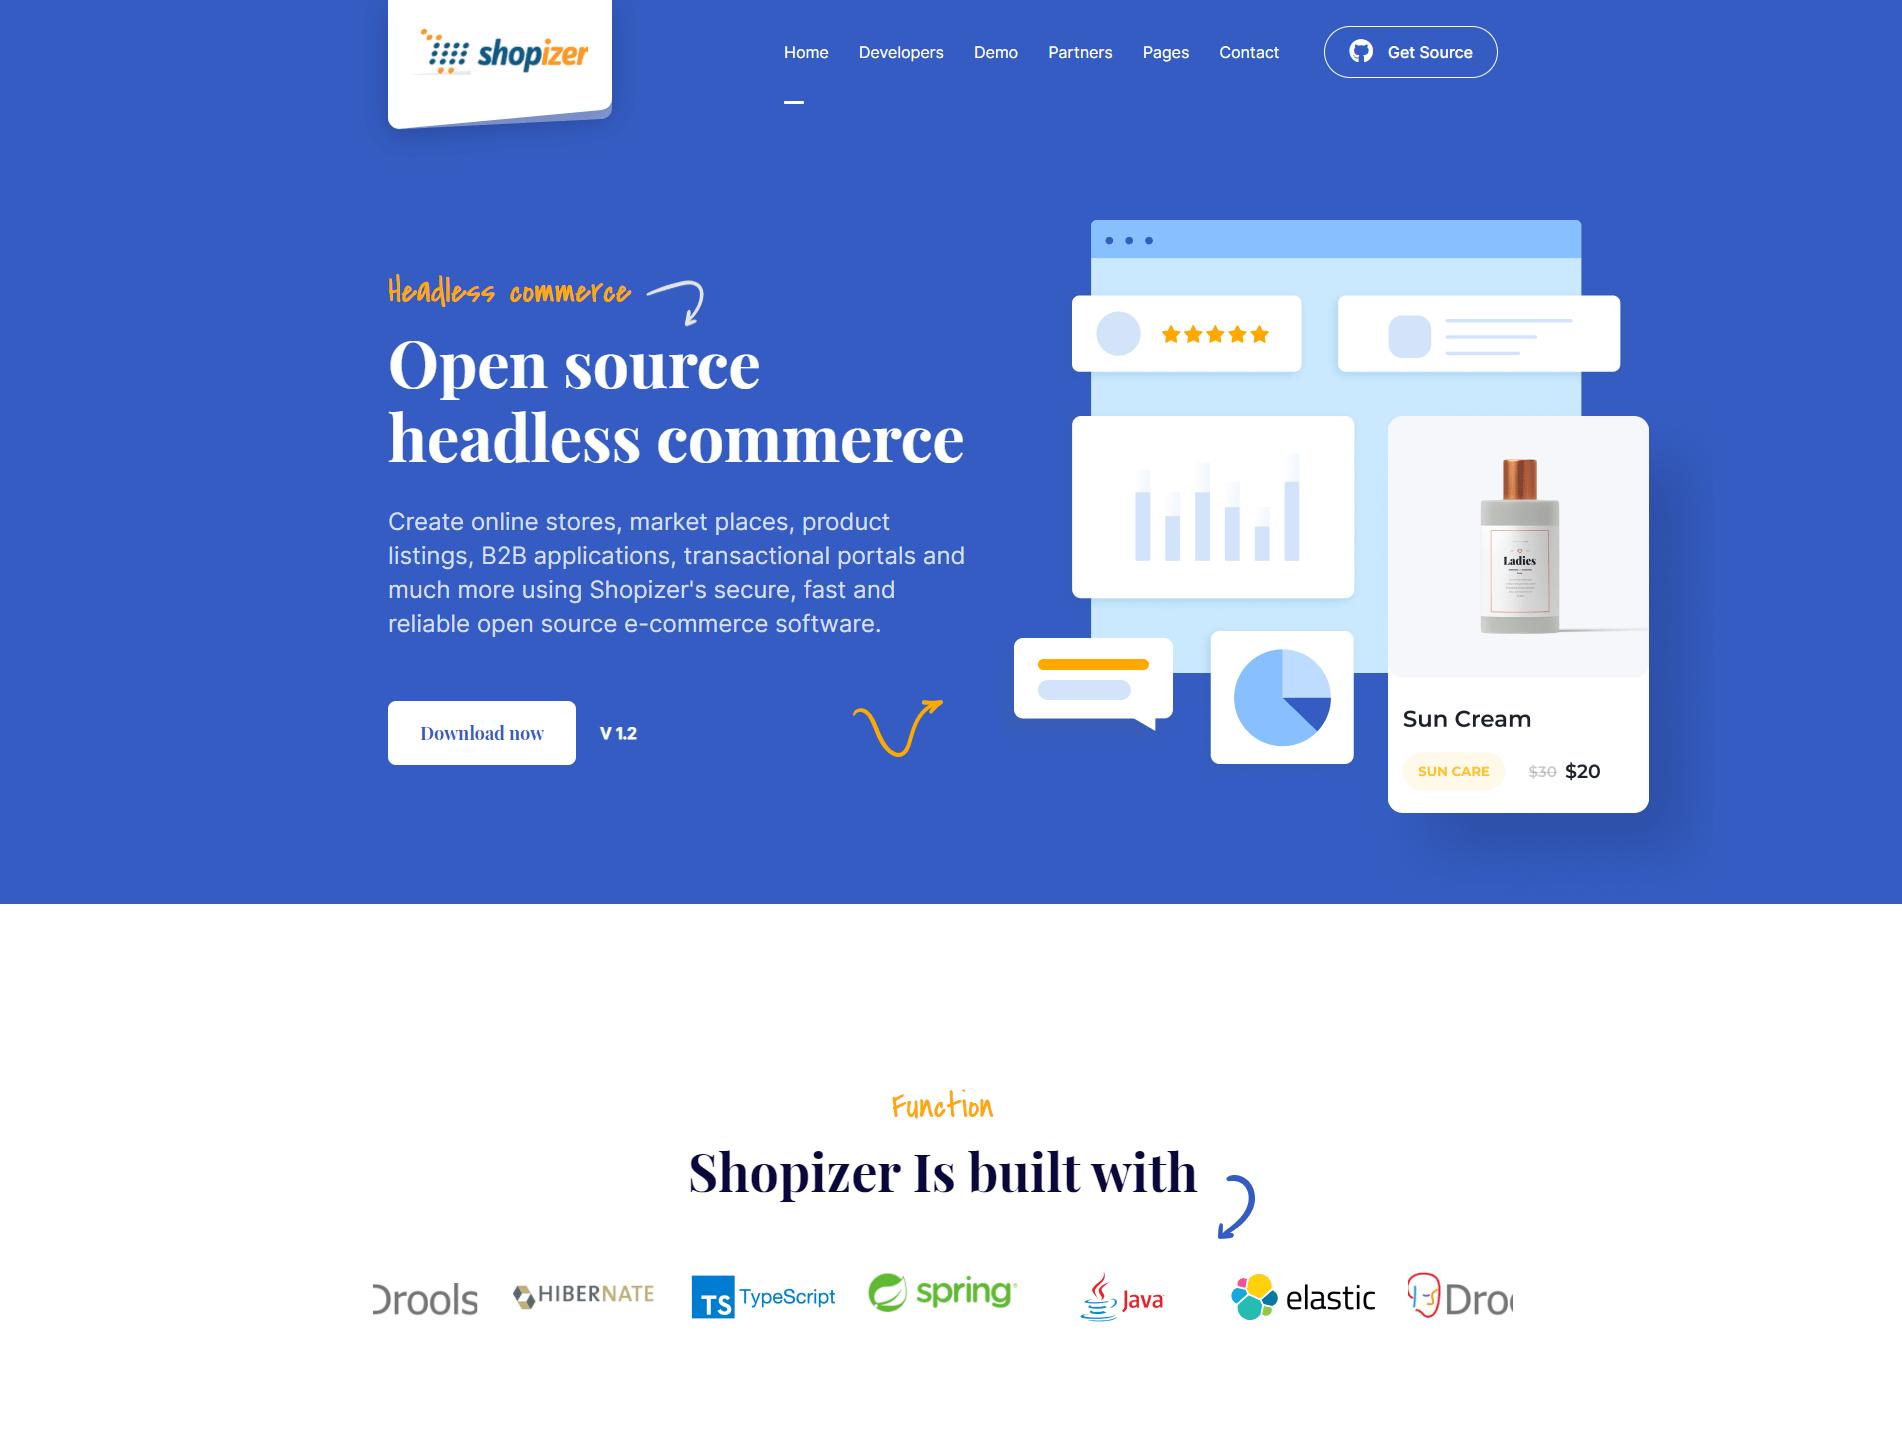 Shopizer – Open source headless commerce